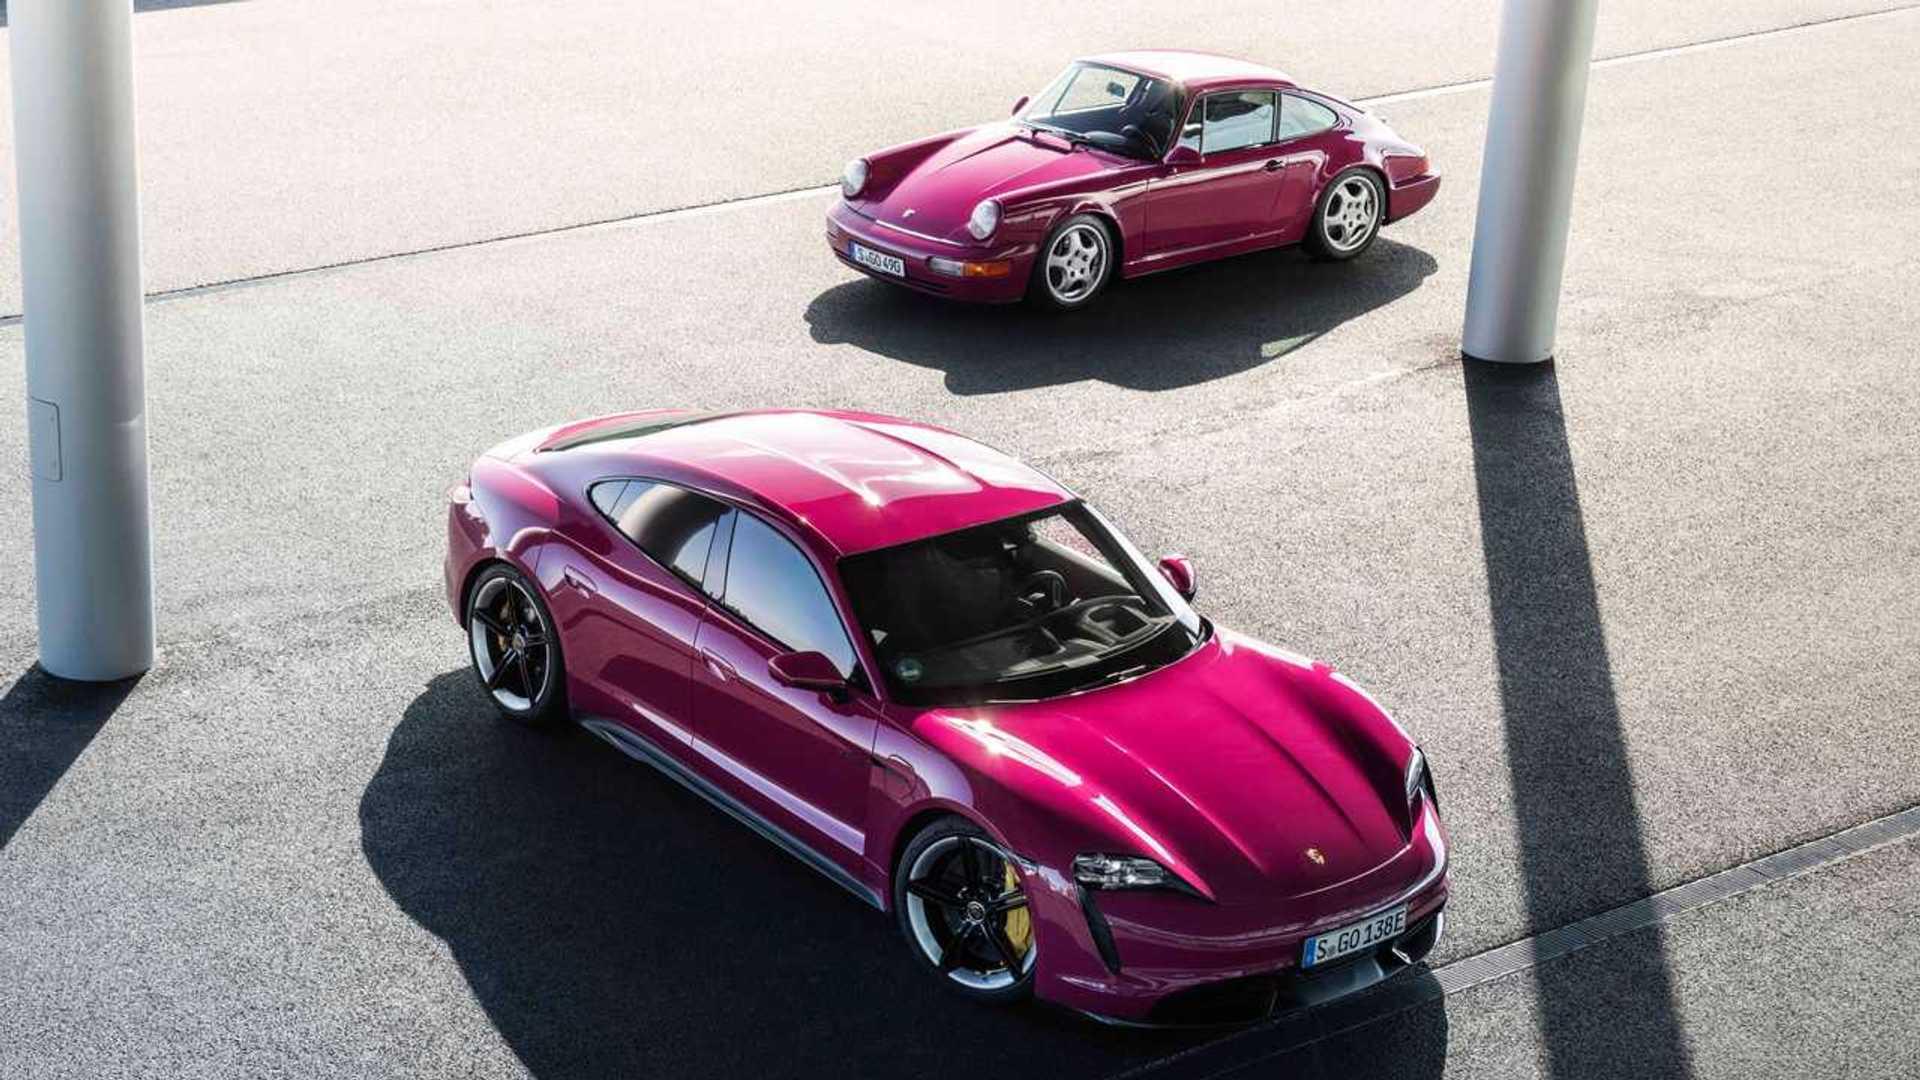 2022 Porsche Taycan Turbo S with 911